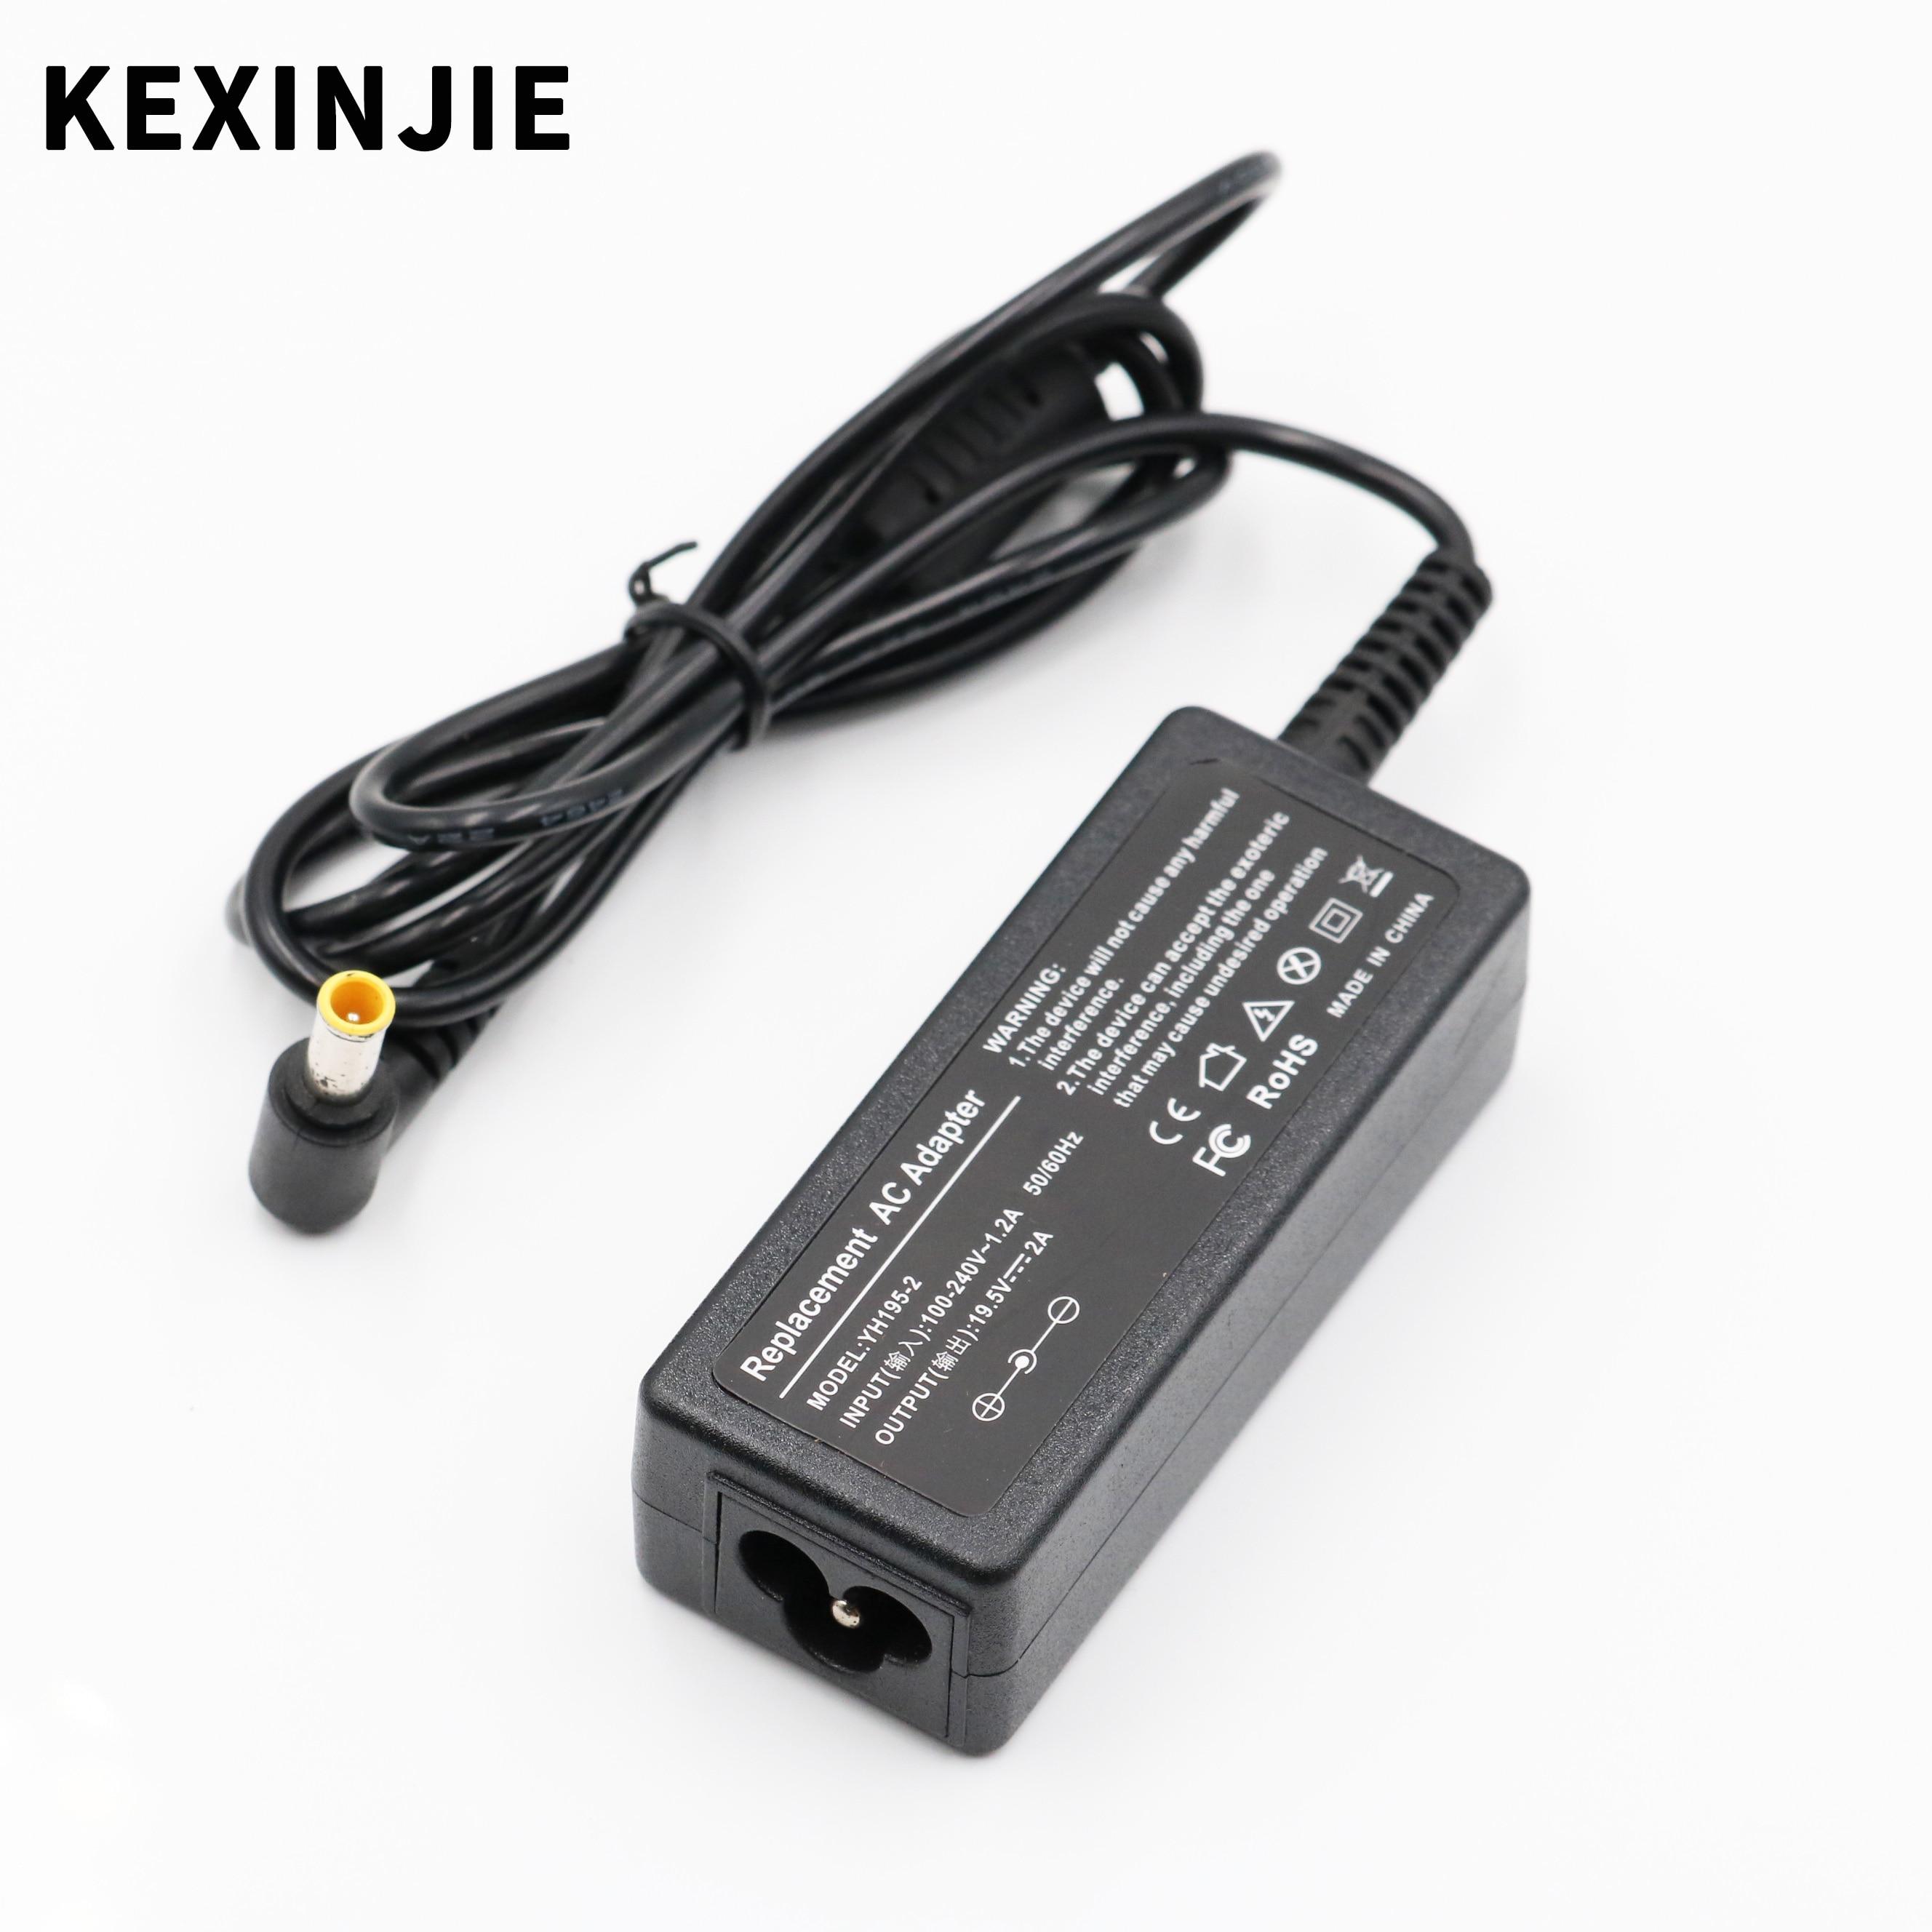 19.5V 2A For Sony VAIO VGP-AC19V39 VGP-AC19V40 VGP-AC19V47 Laptop Netbook Ac Adapter Power Supply Ch